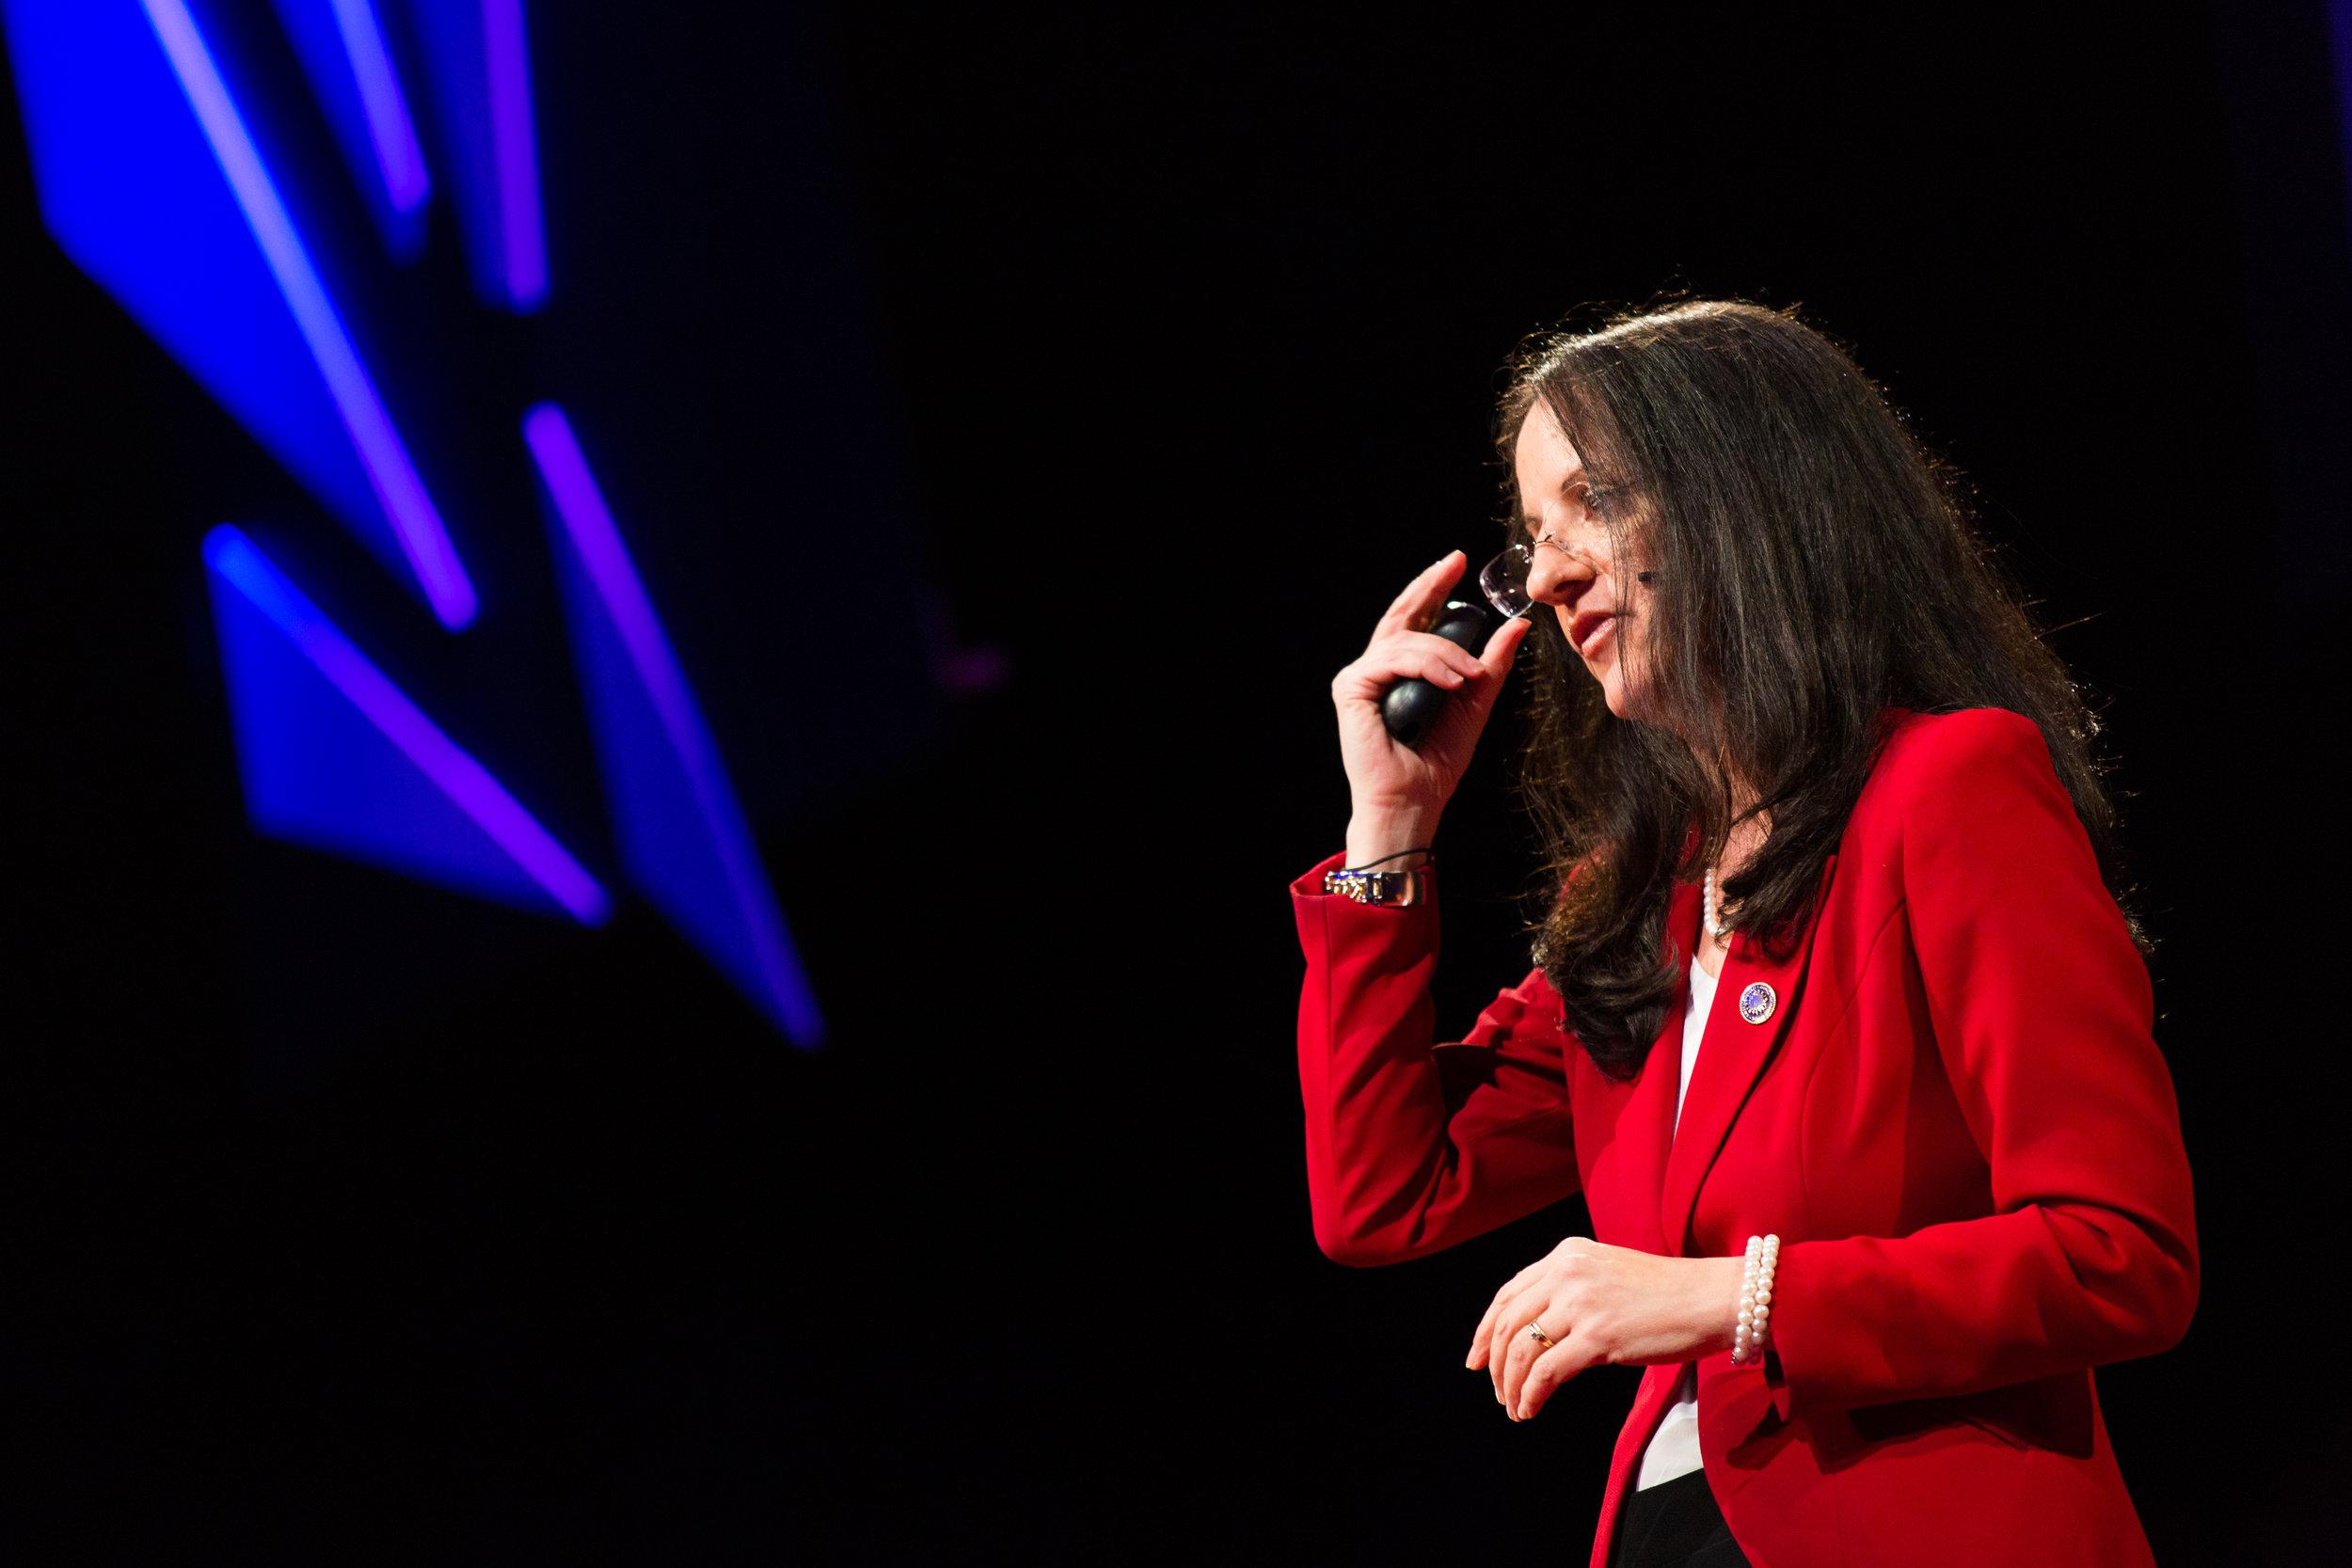 042317-TedXFobo2017-107.jpg